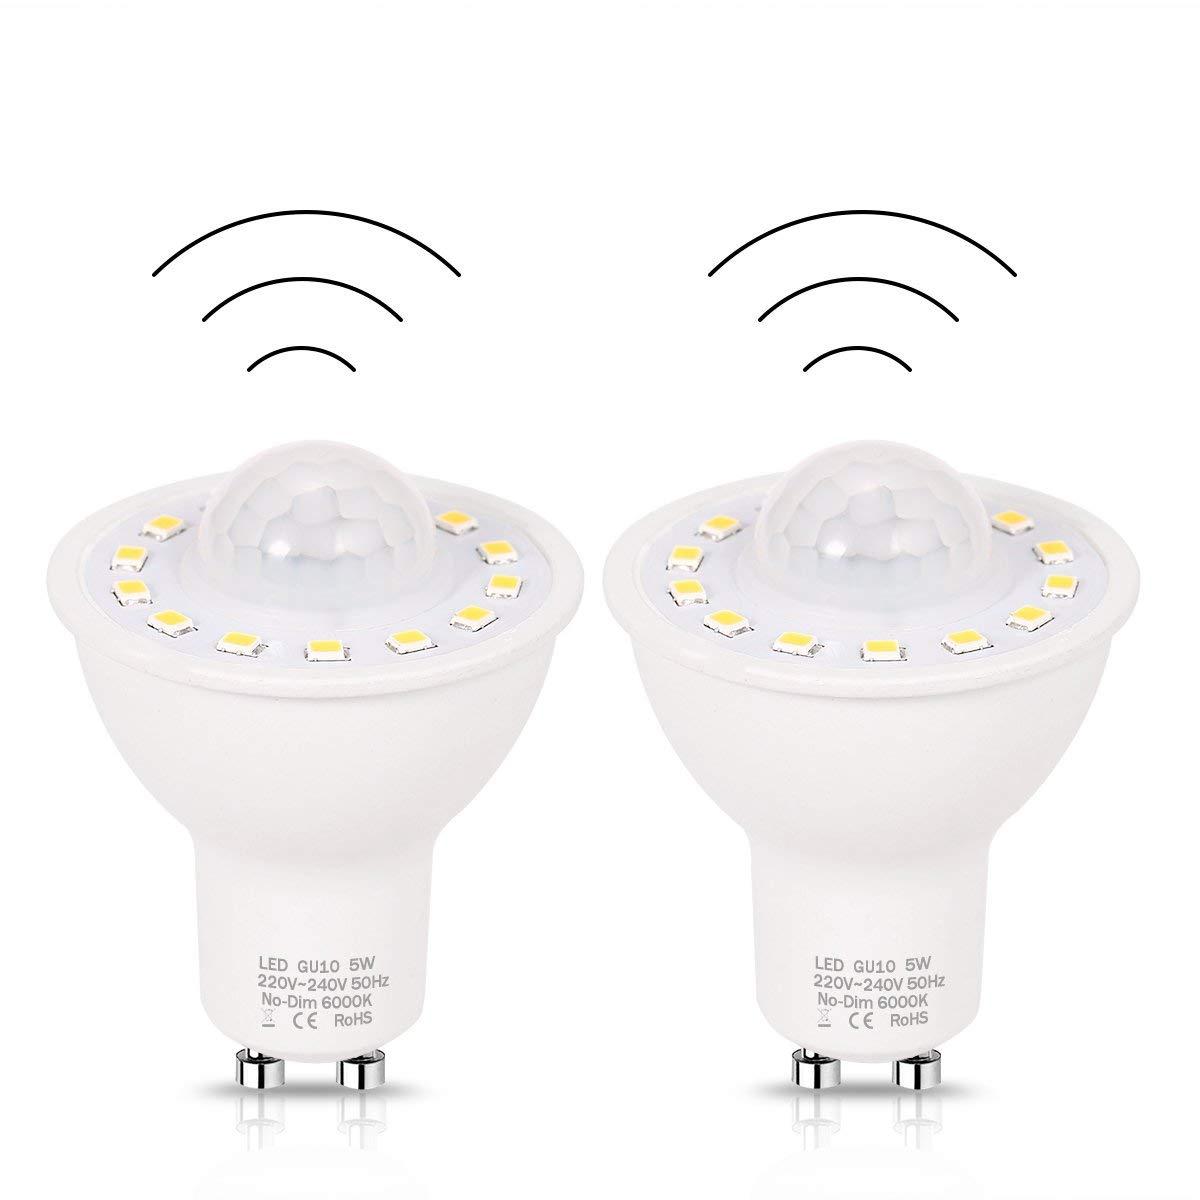 GU10 PIR Motion Sensor LED Light Bulbs 5W,50W Equivalent 500lm Day White 6000K for Stairs Garage Corridor Walkway Hallway-2Pack